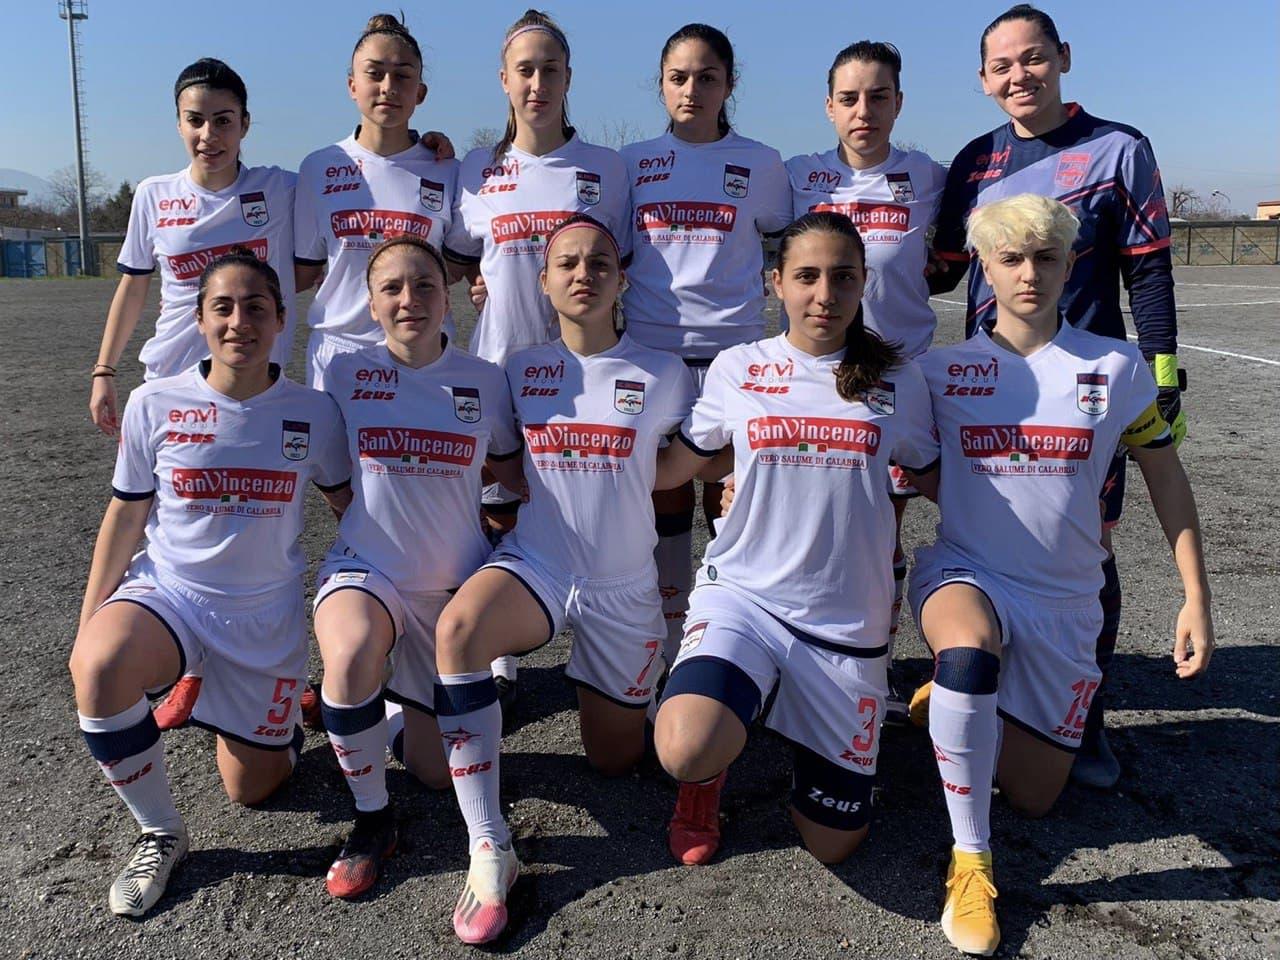 Femminile Serie C, 9a giornata: Sant'Egidio-Crotone 2-0